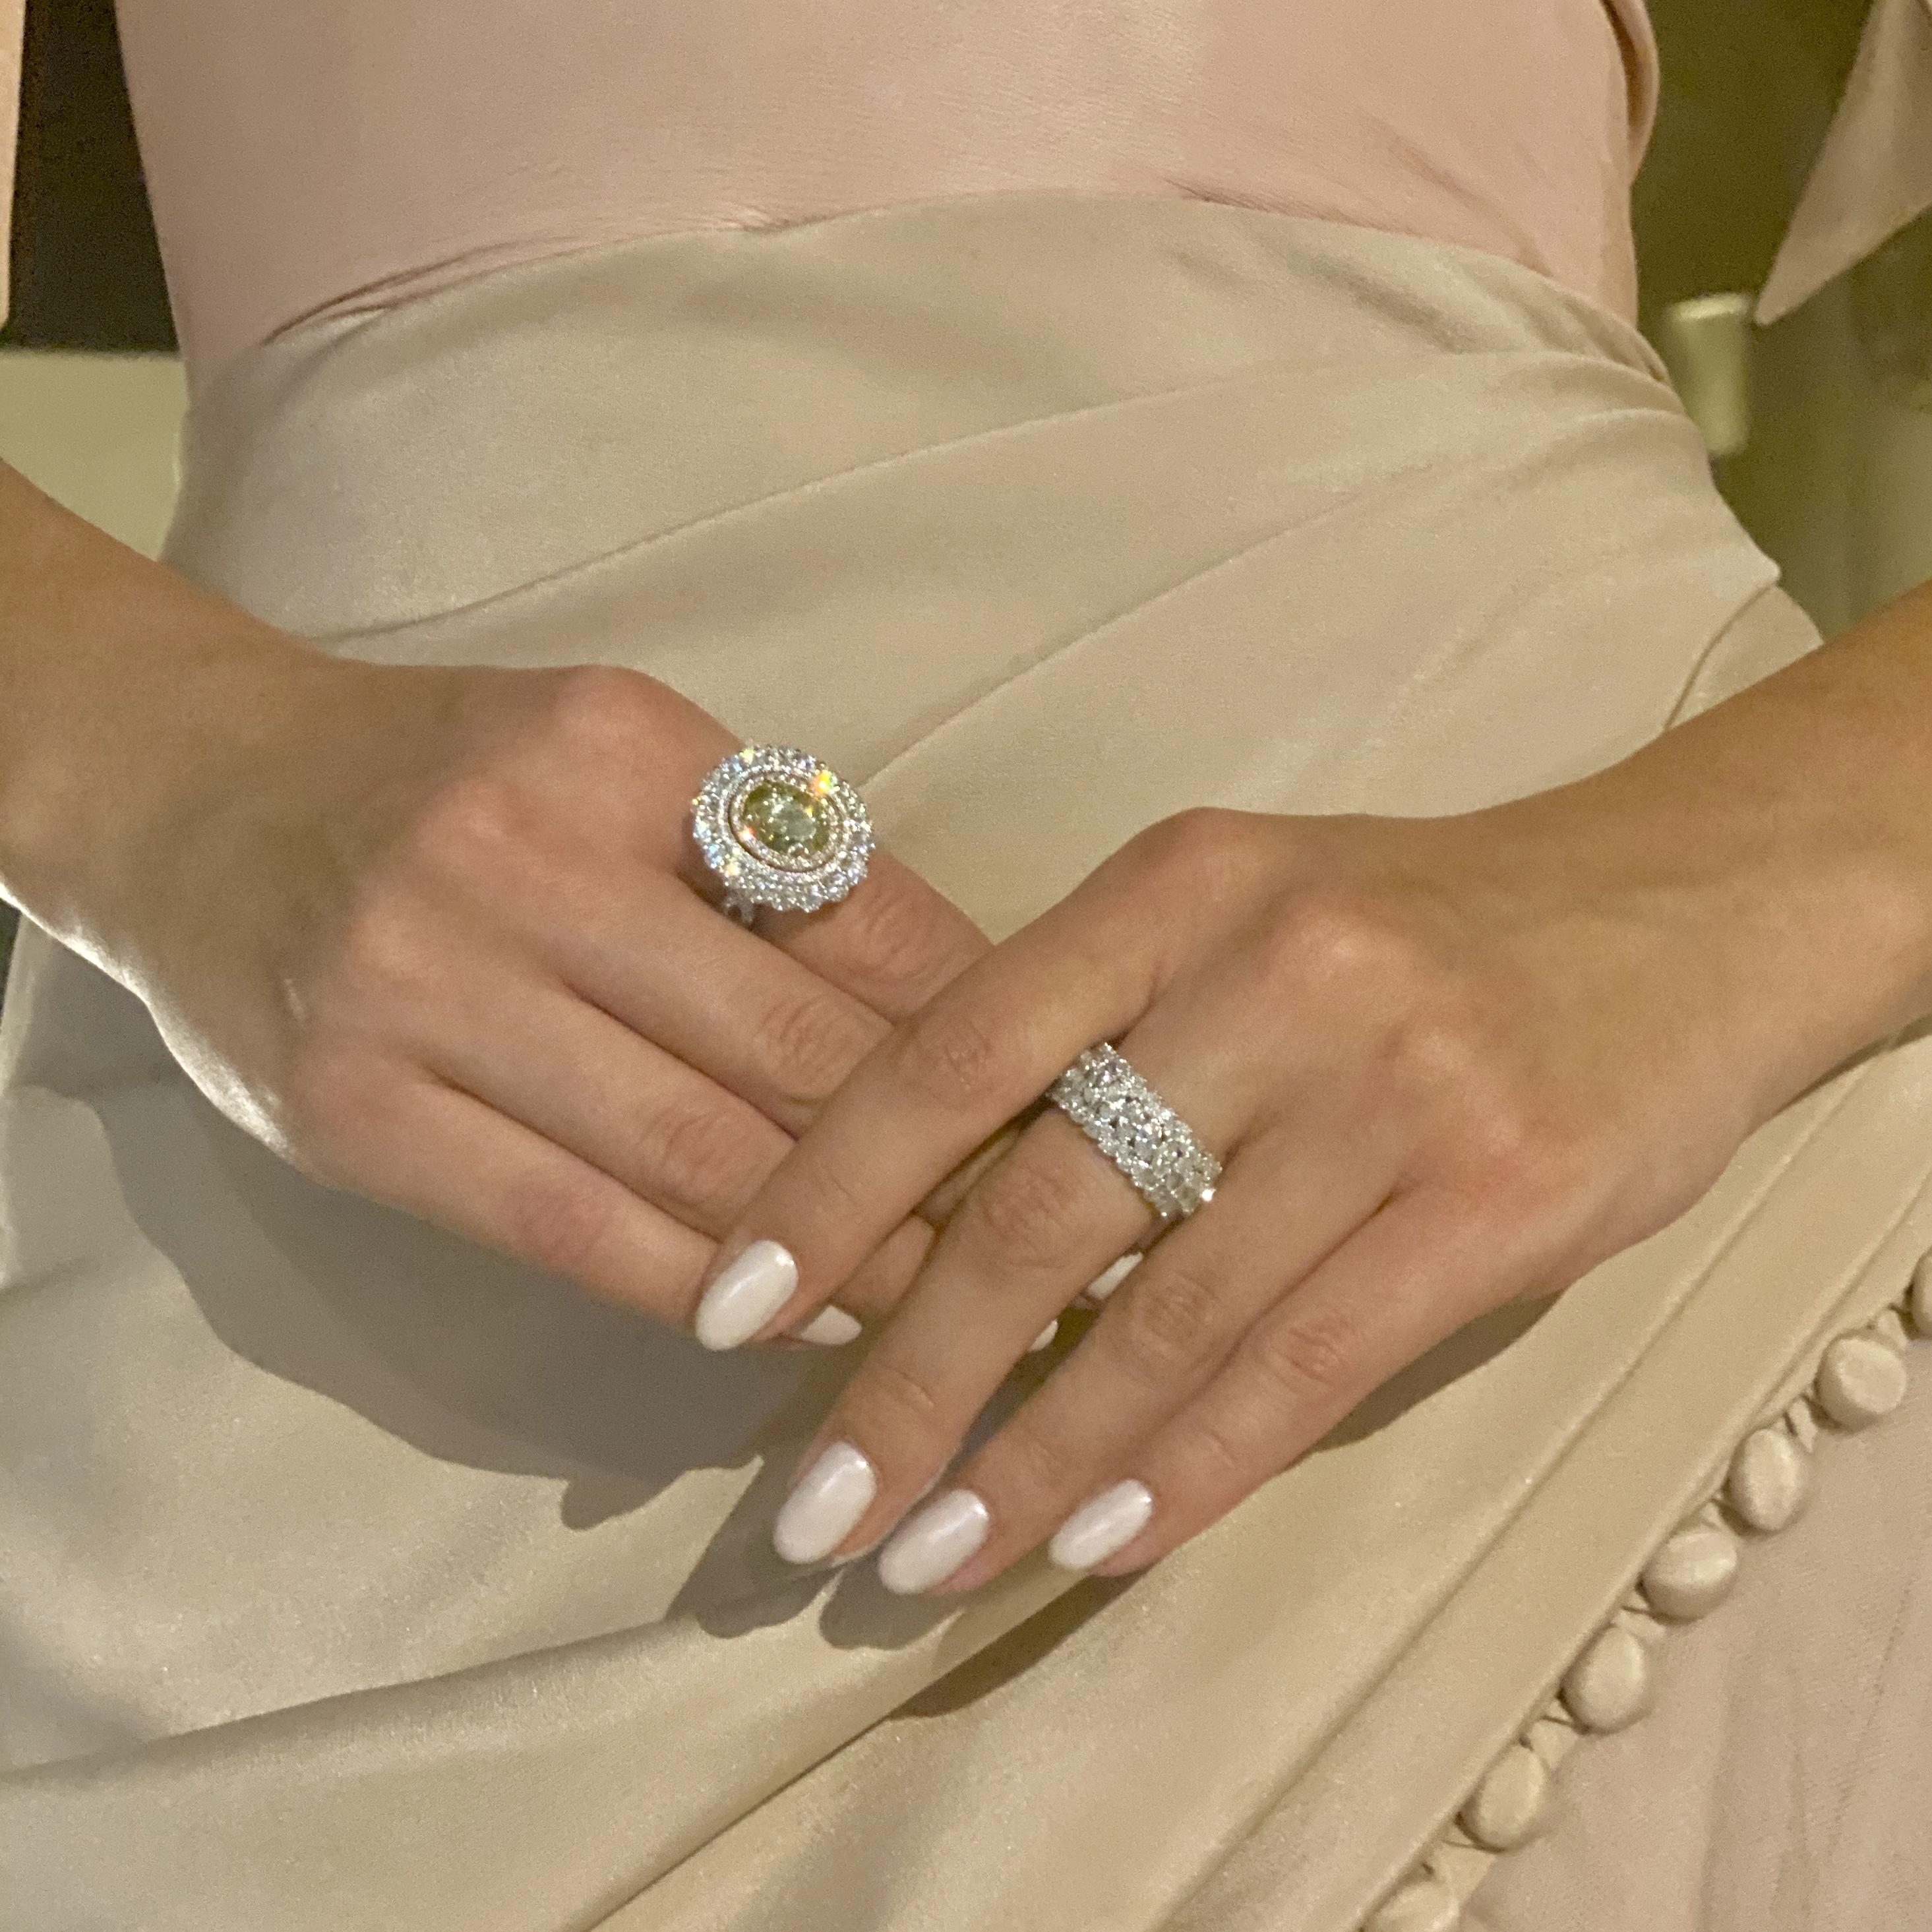 Emirati Collection Launch UAE Abu Dhabi Yellow Diamond White Diamond Ring Earrings Necklace Jewellery